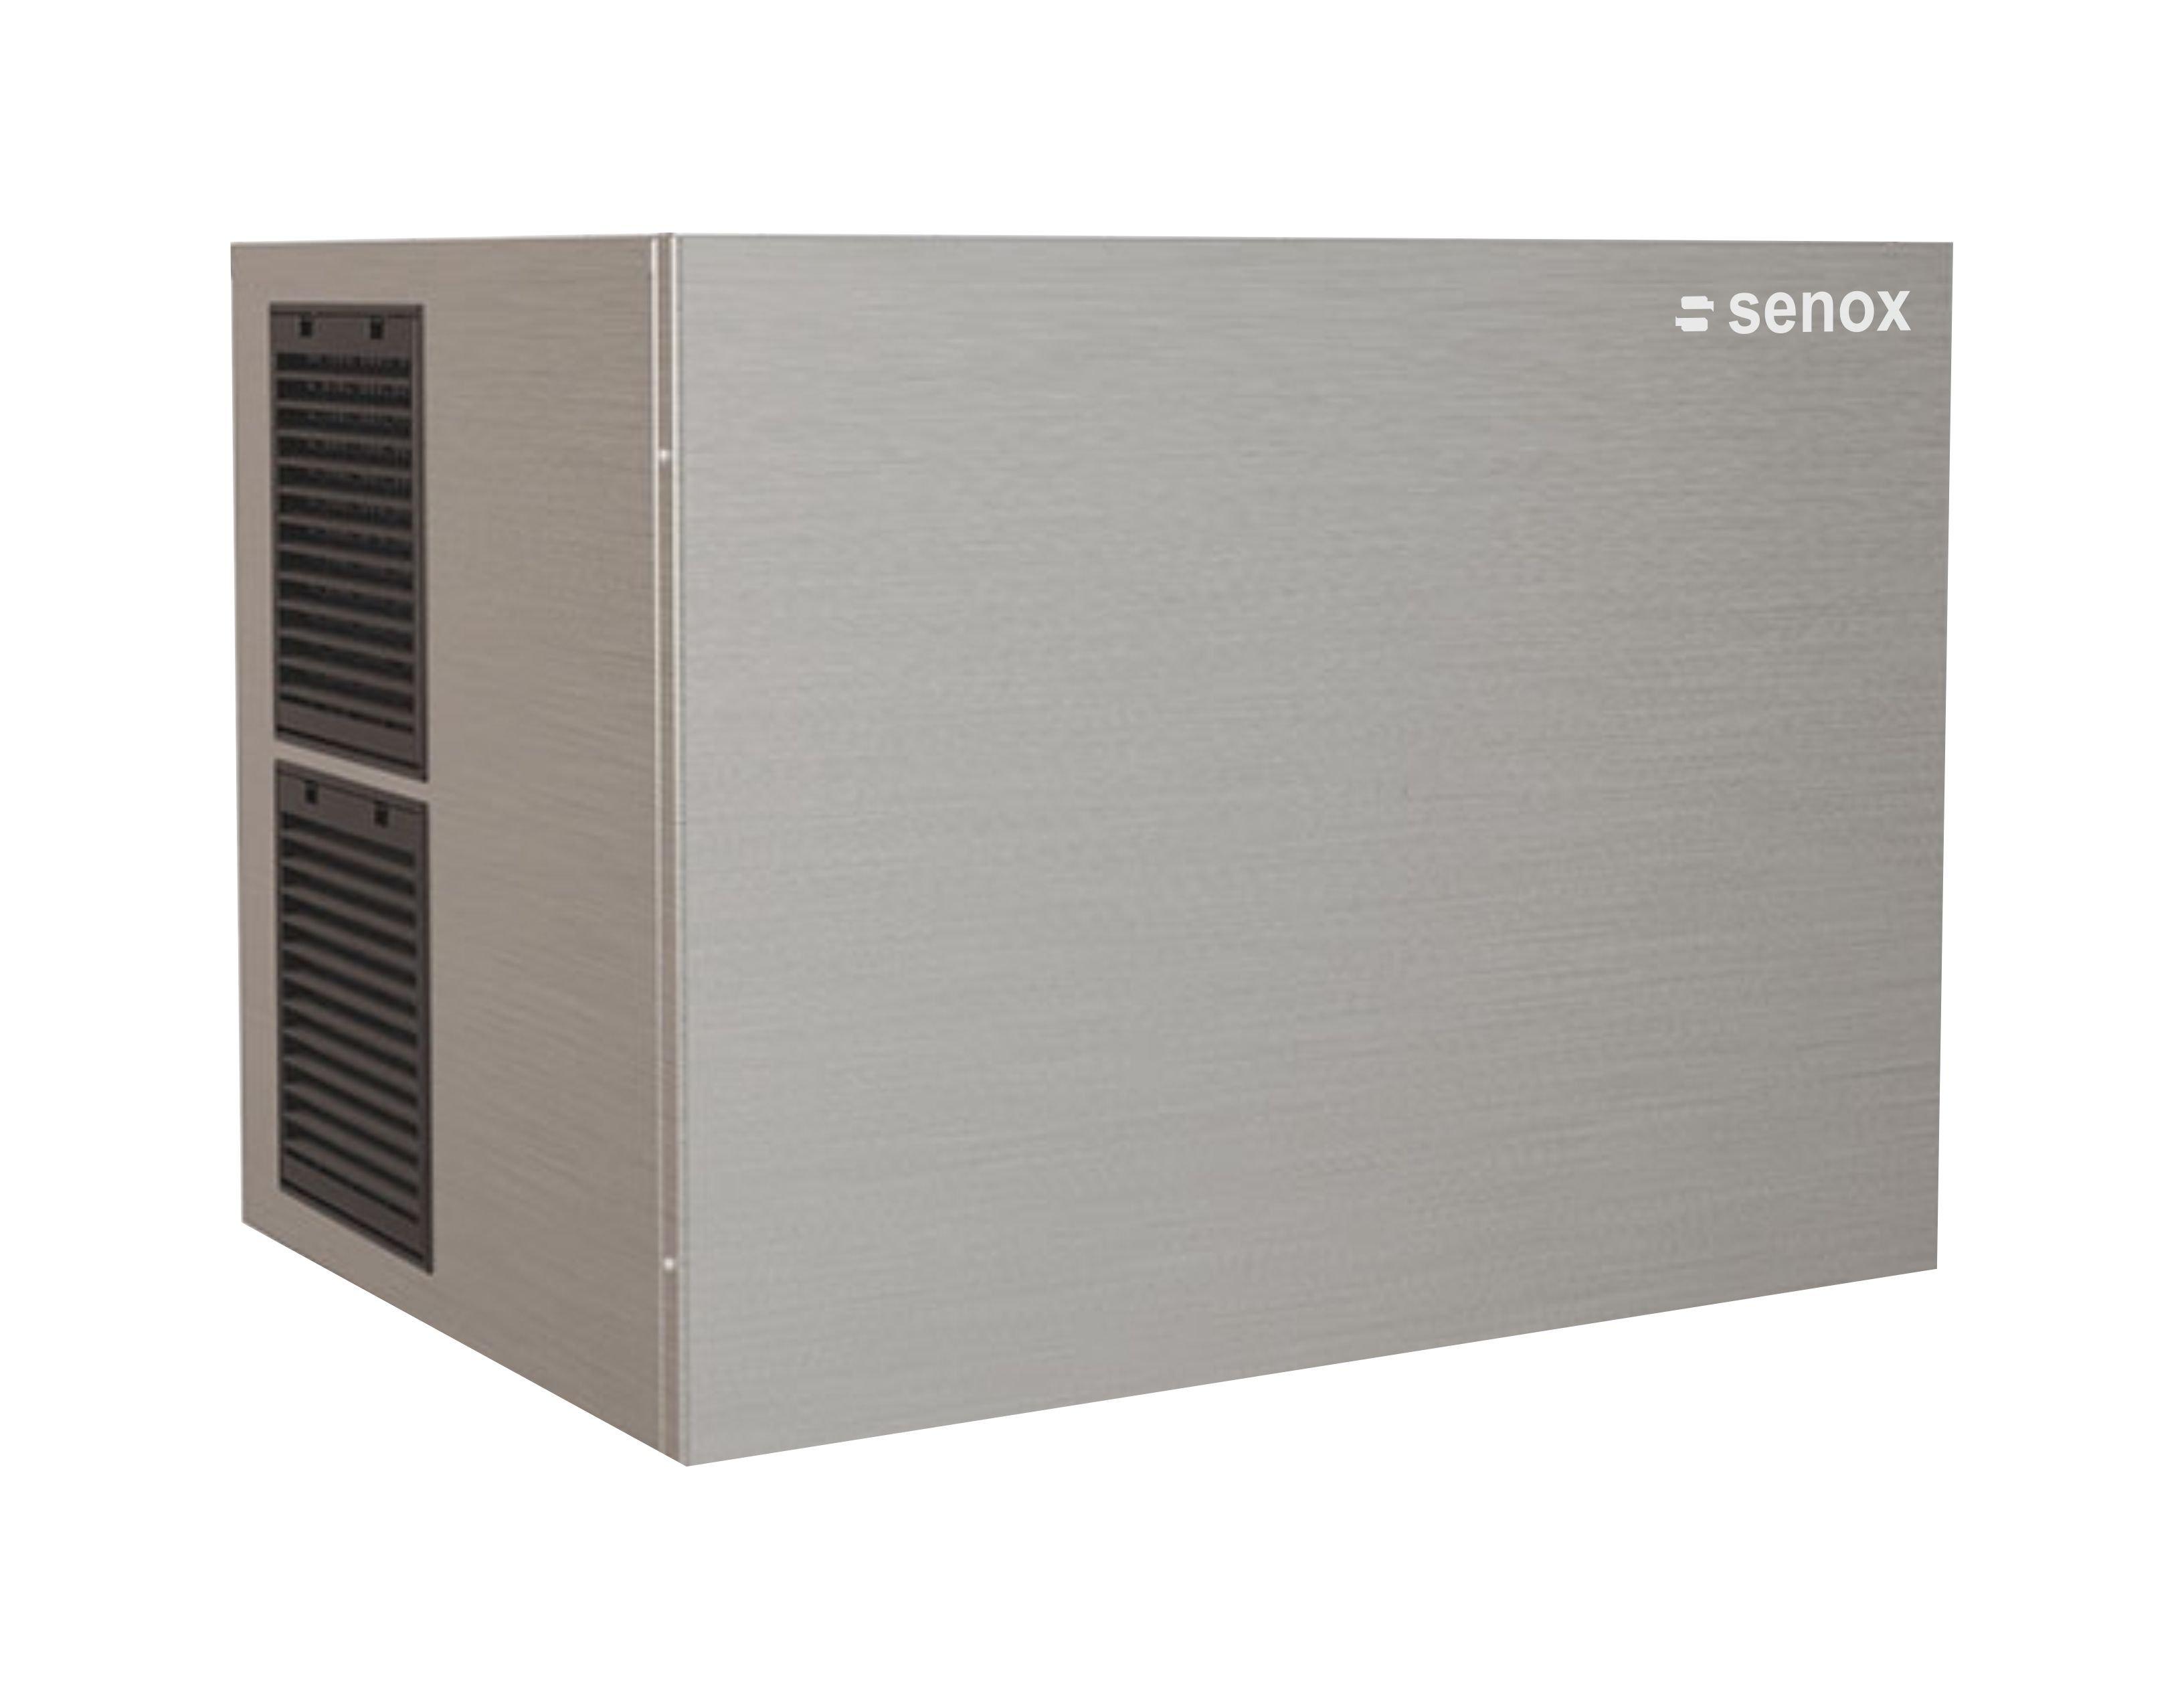 senox-fr-500